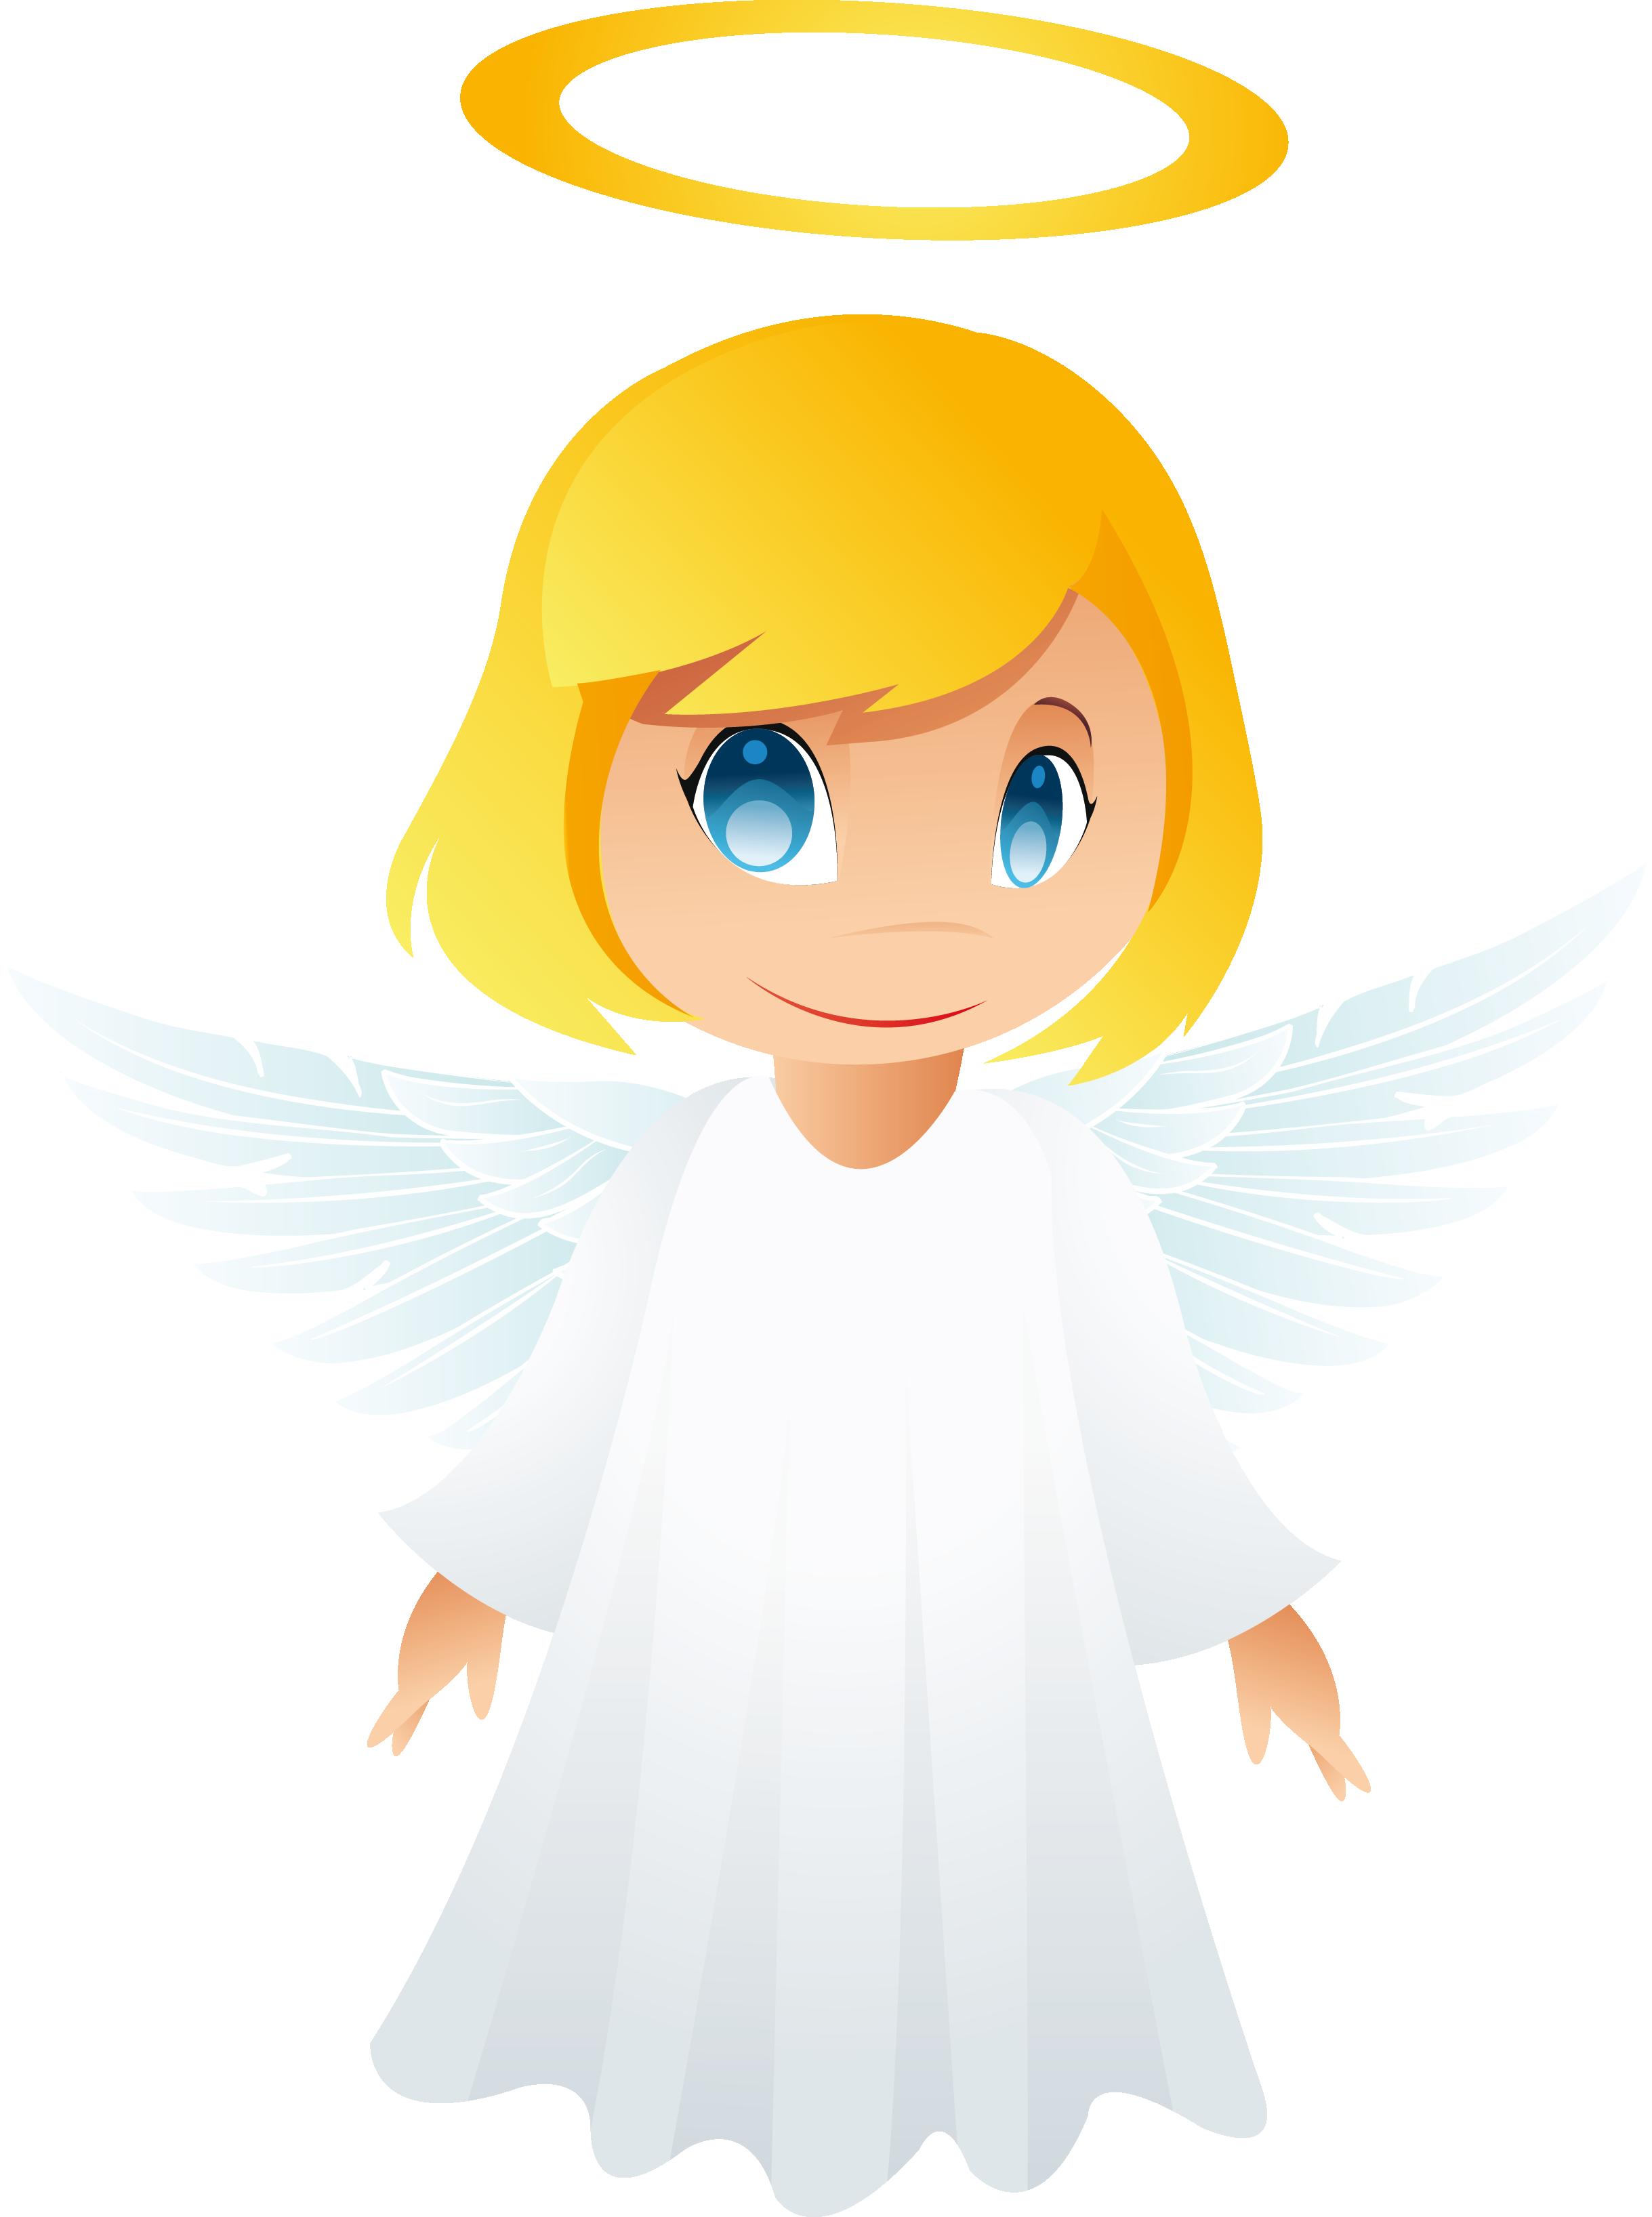 Angel Clipart Free Graphics Of Cherubs A-Angel clipart free graphics of cherubs and angels the cliparts-6